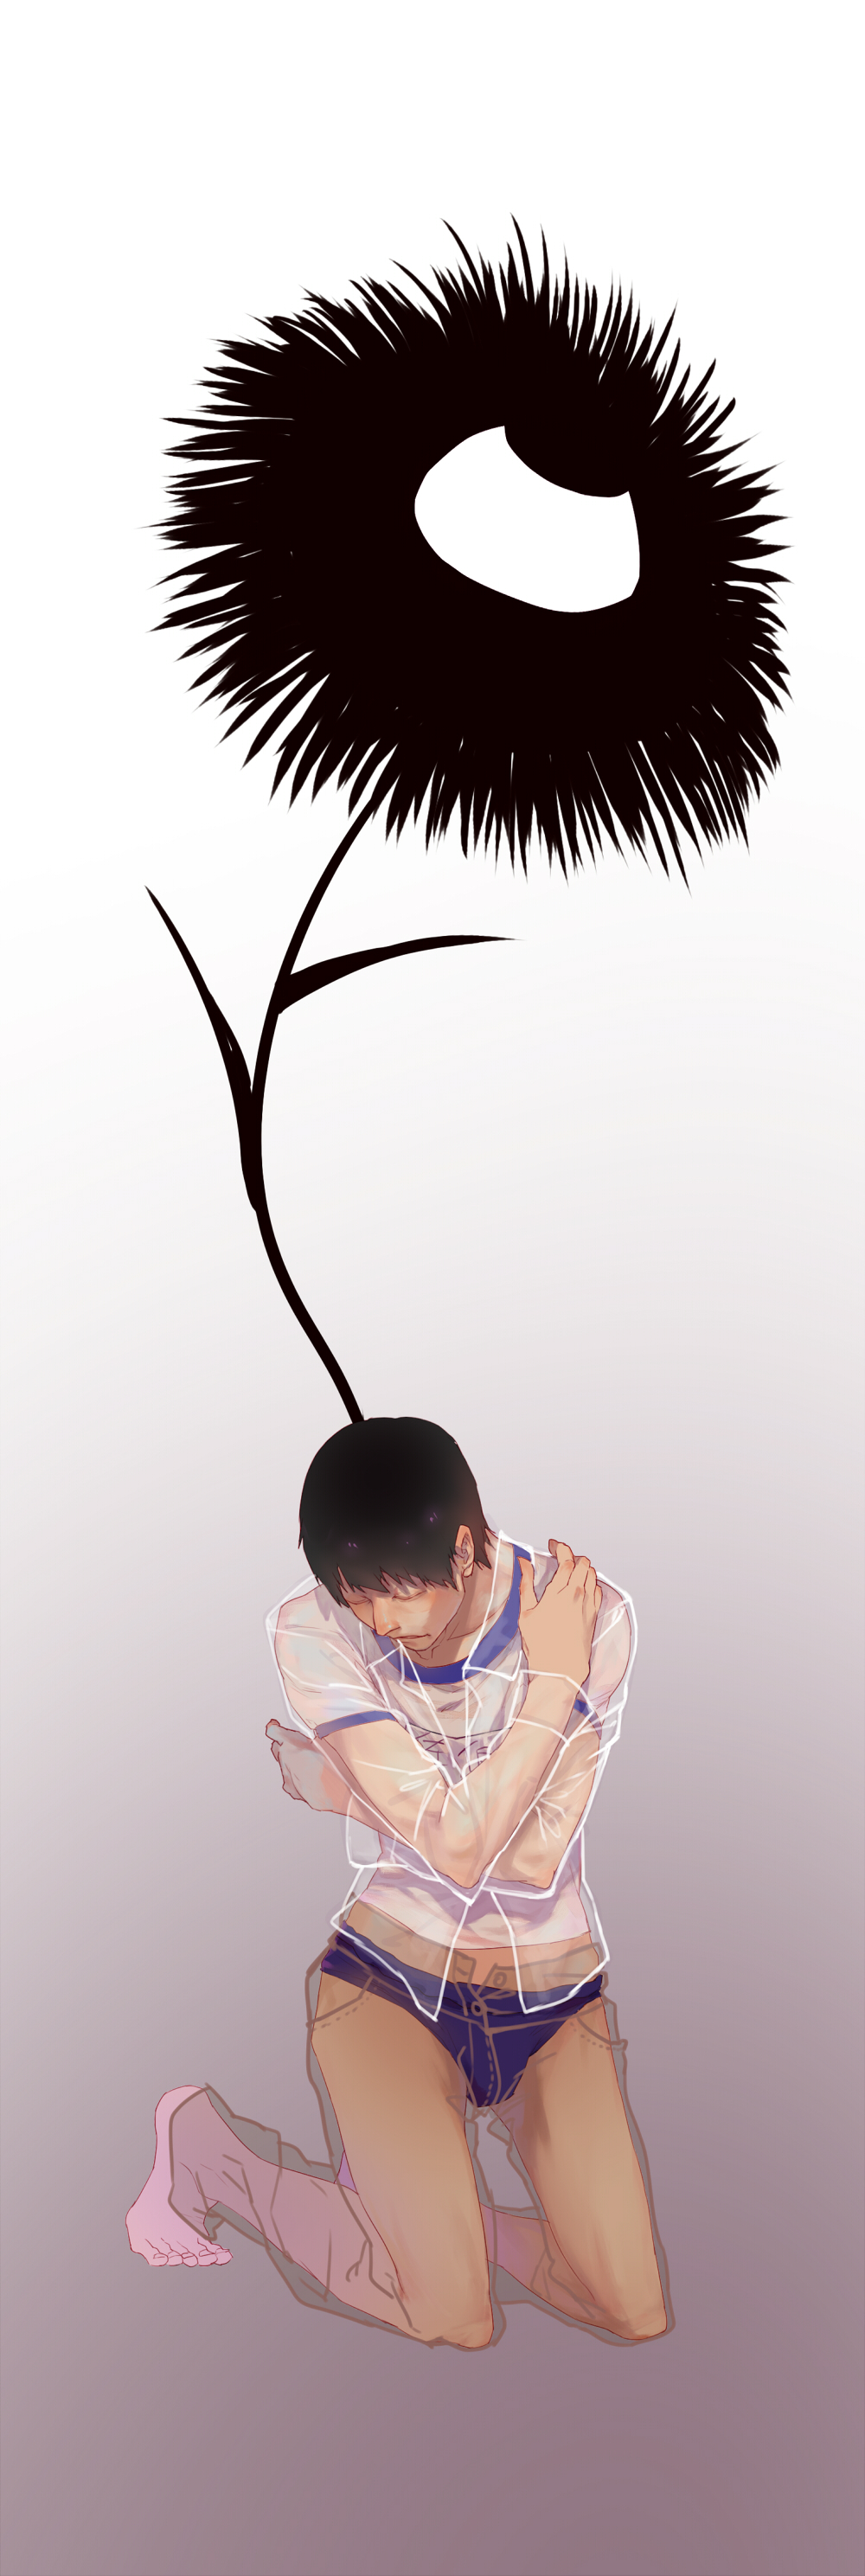 Aku no Hana - Evil Blood - Vol. 7 (In Japanese) [Comic]